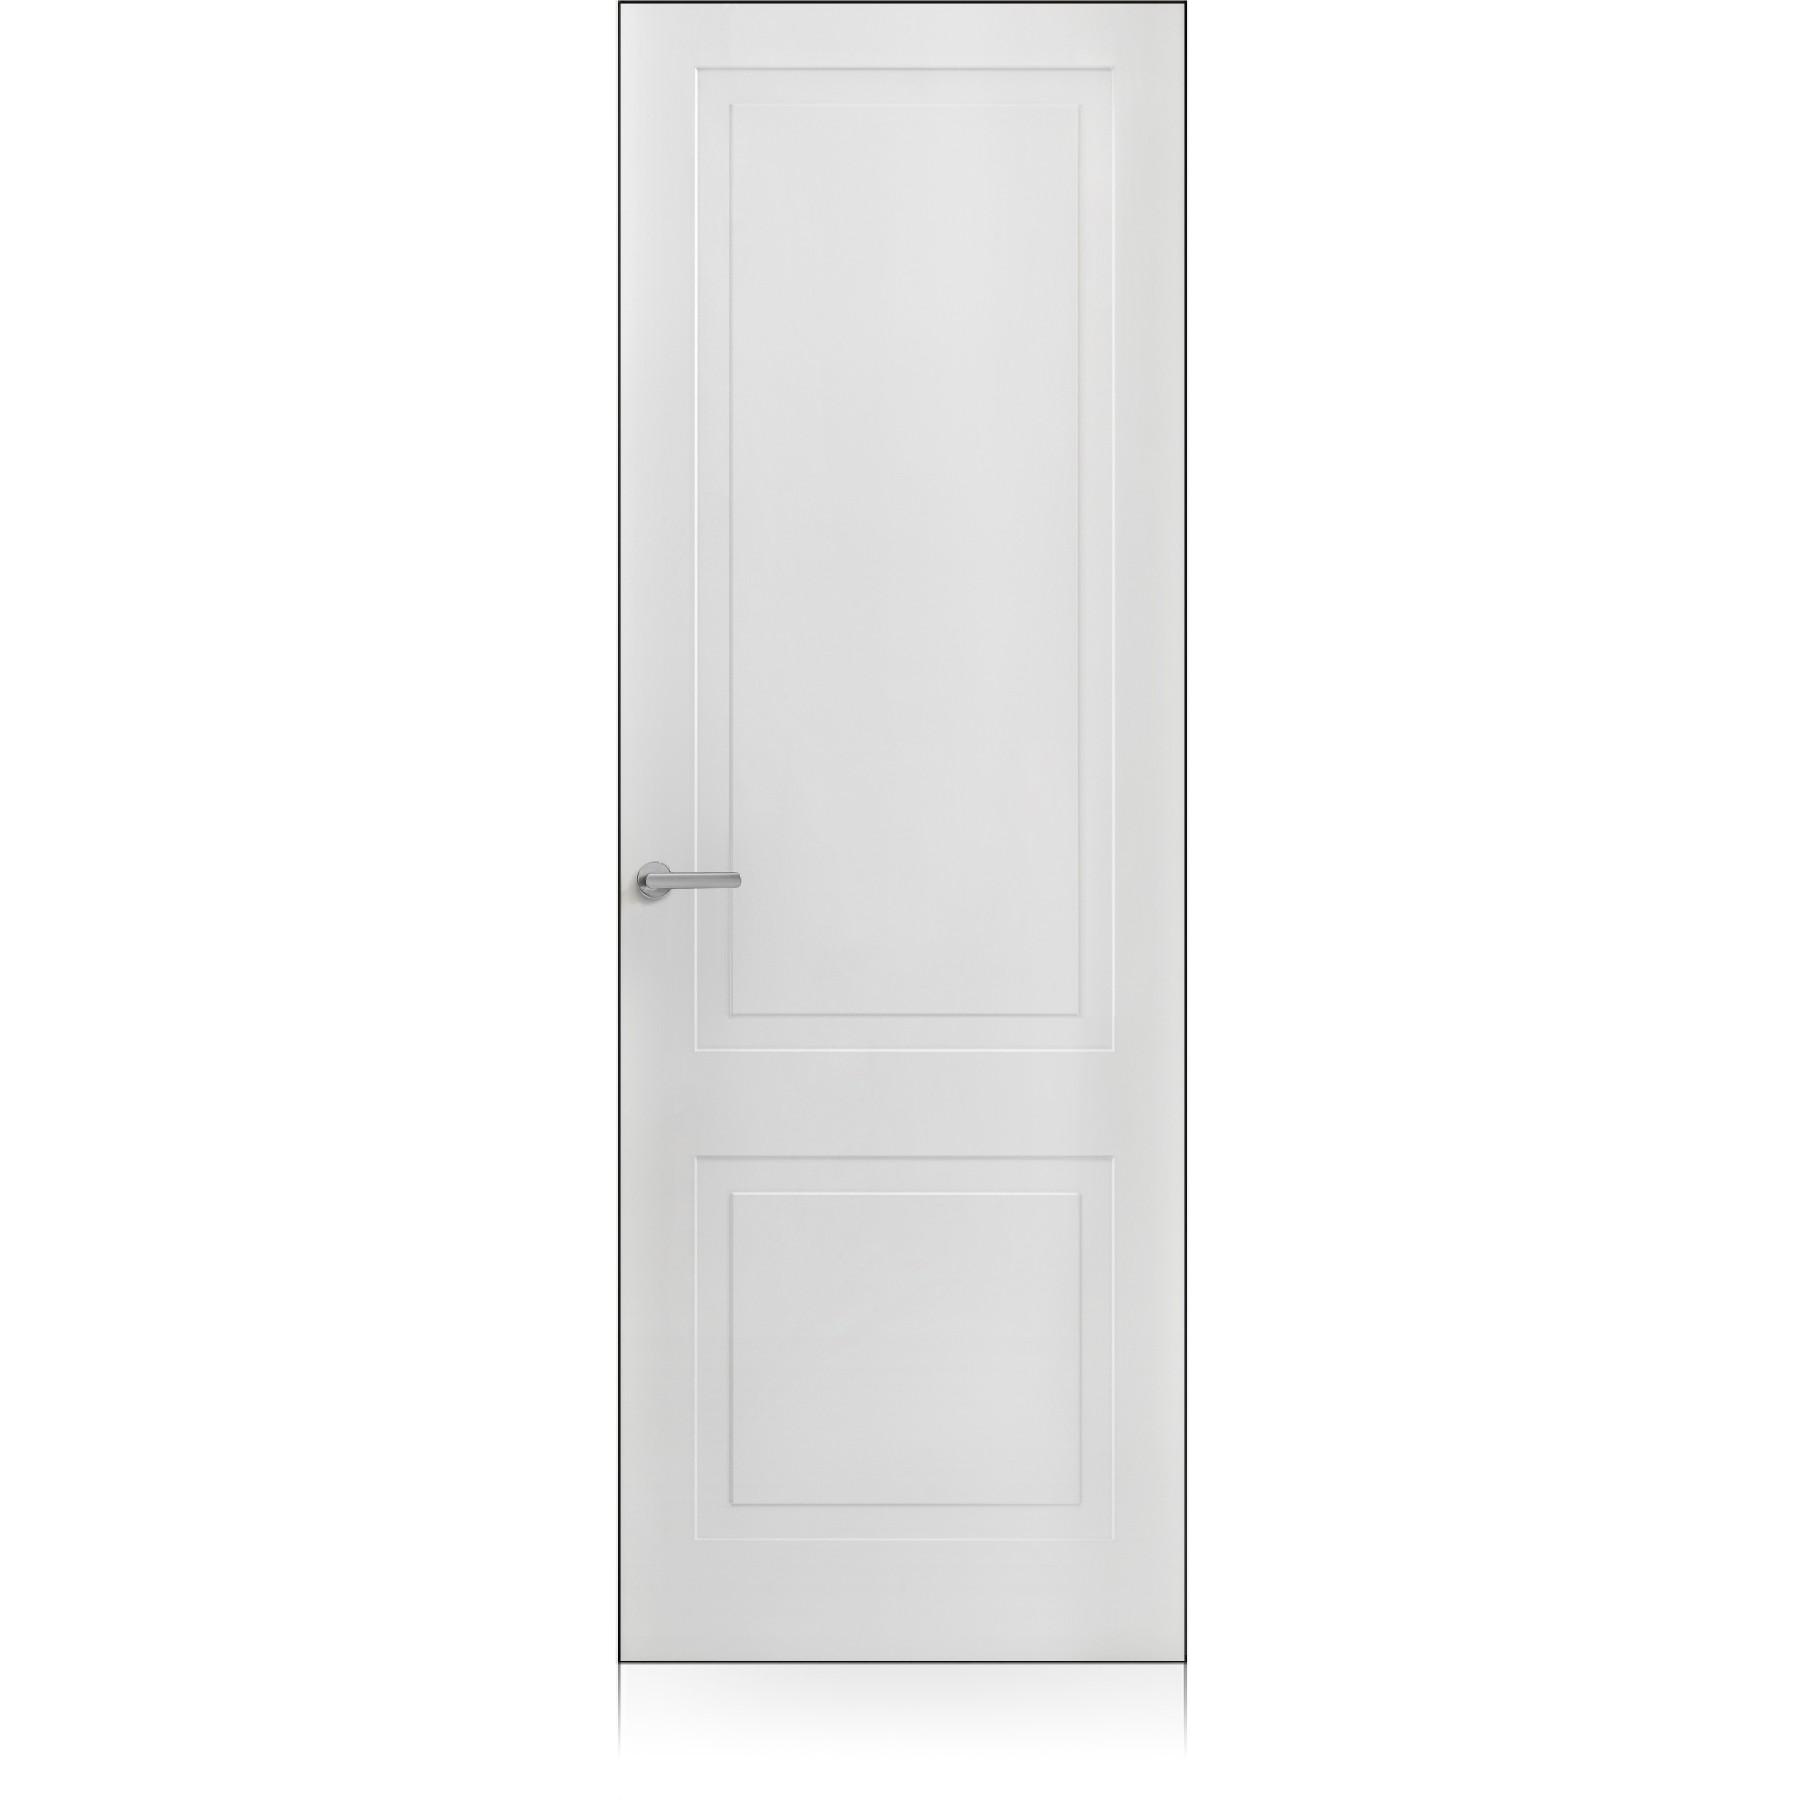 Porta Mixy / 2 Zero bianco